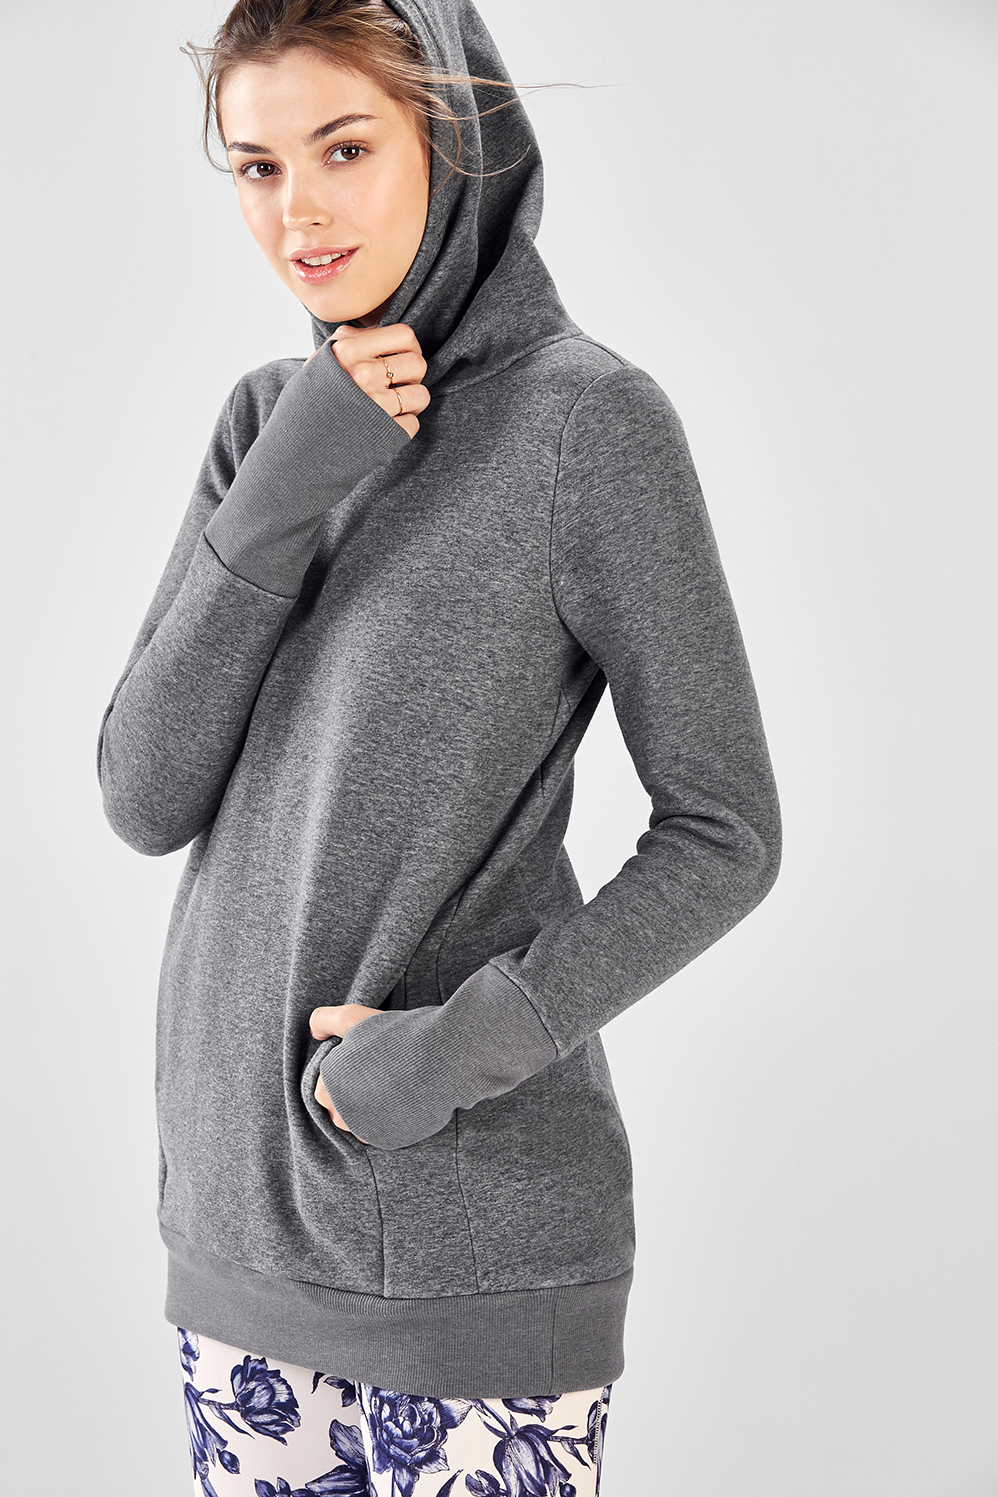 9a6700403d Zaylee Fleece Hoodie - Grey Heather